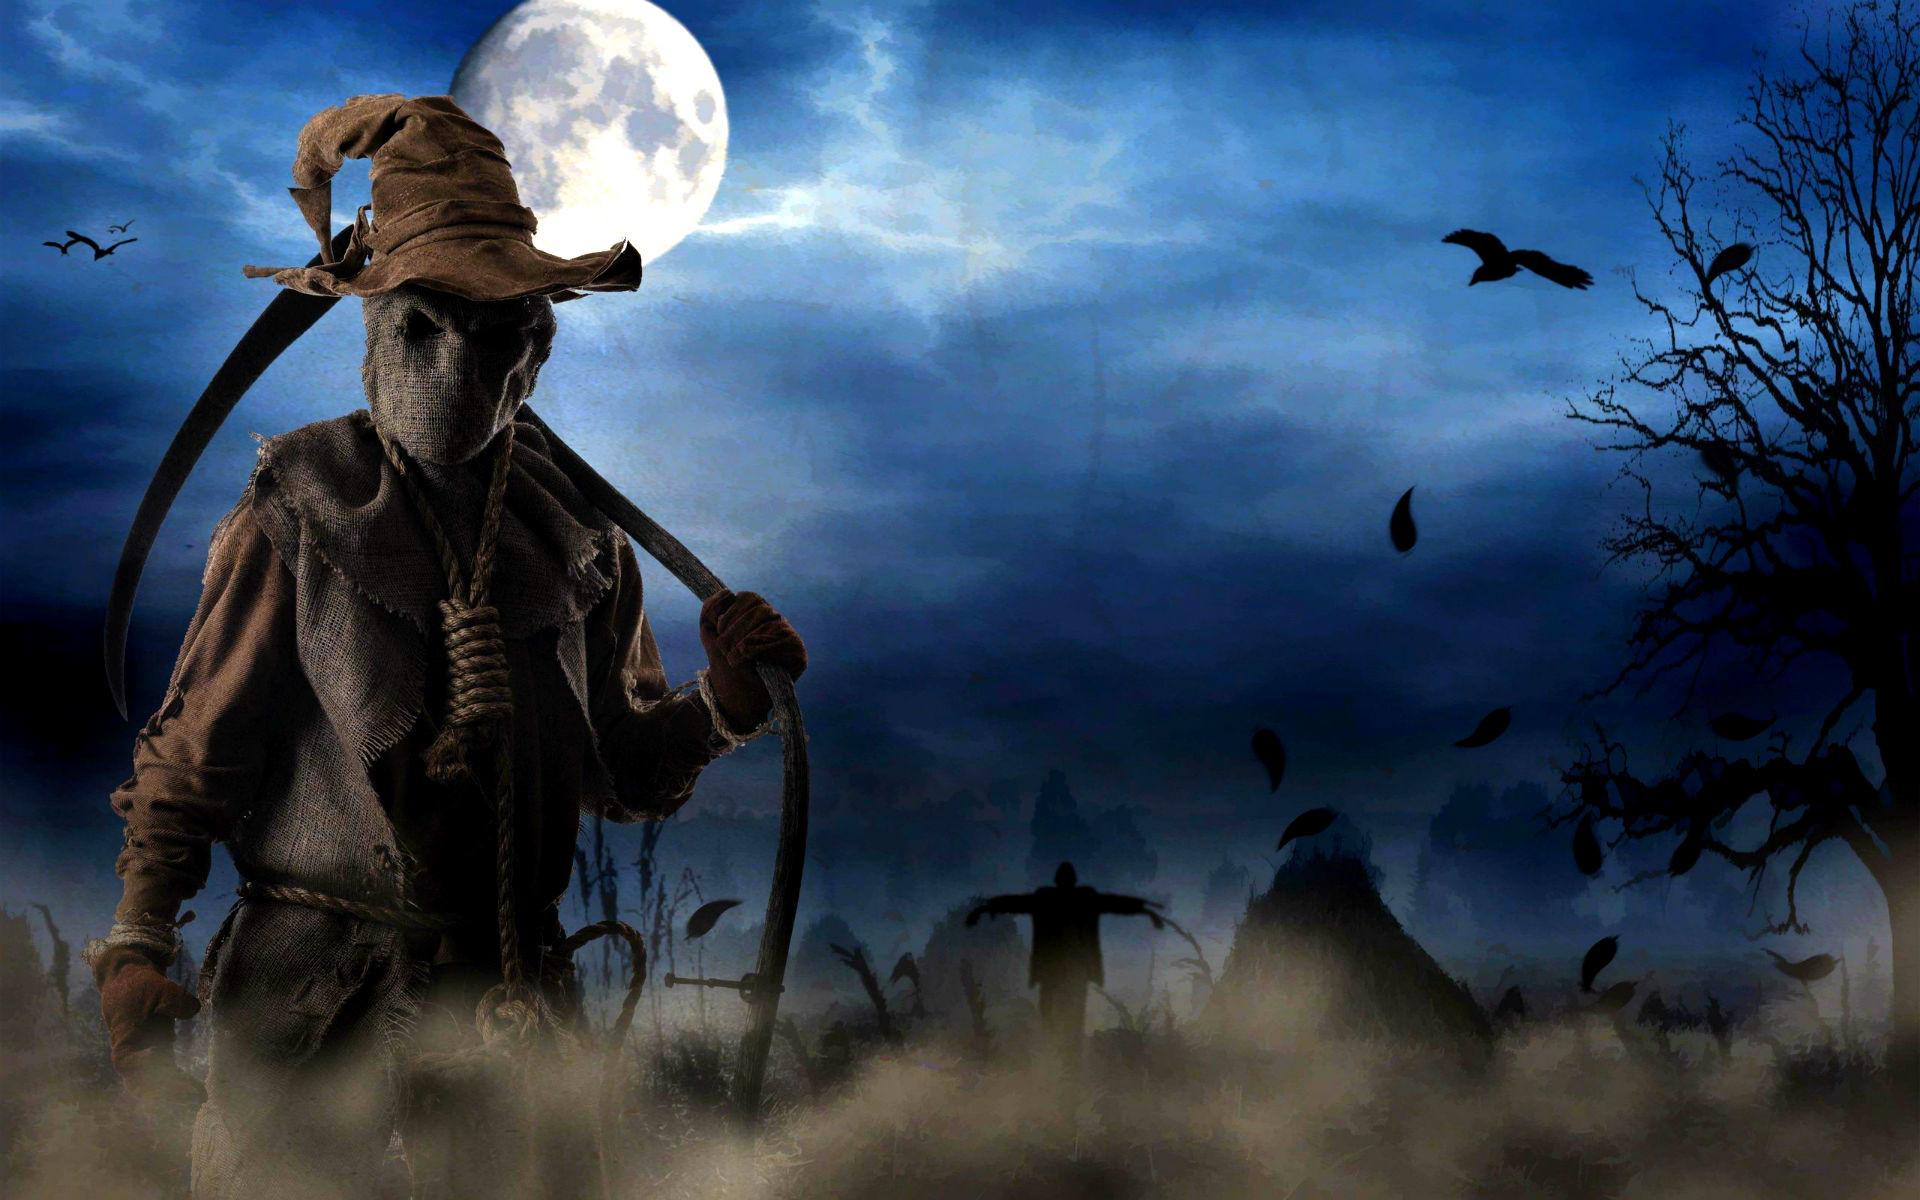 Halloween Wallpaper Download Free Scary Hd – Wallpapers Mela